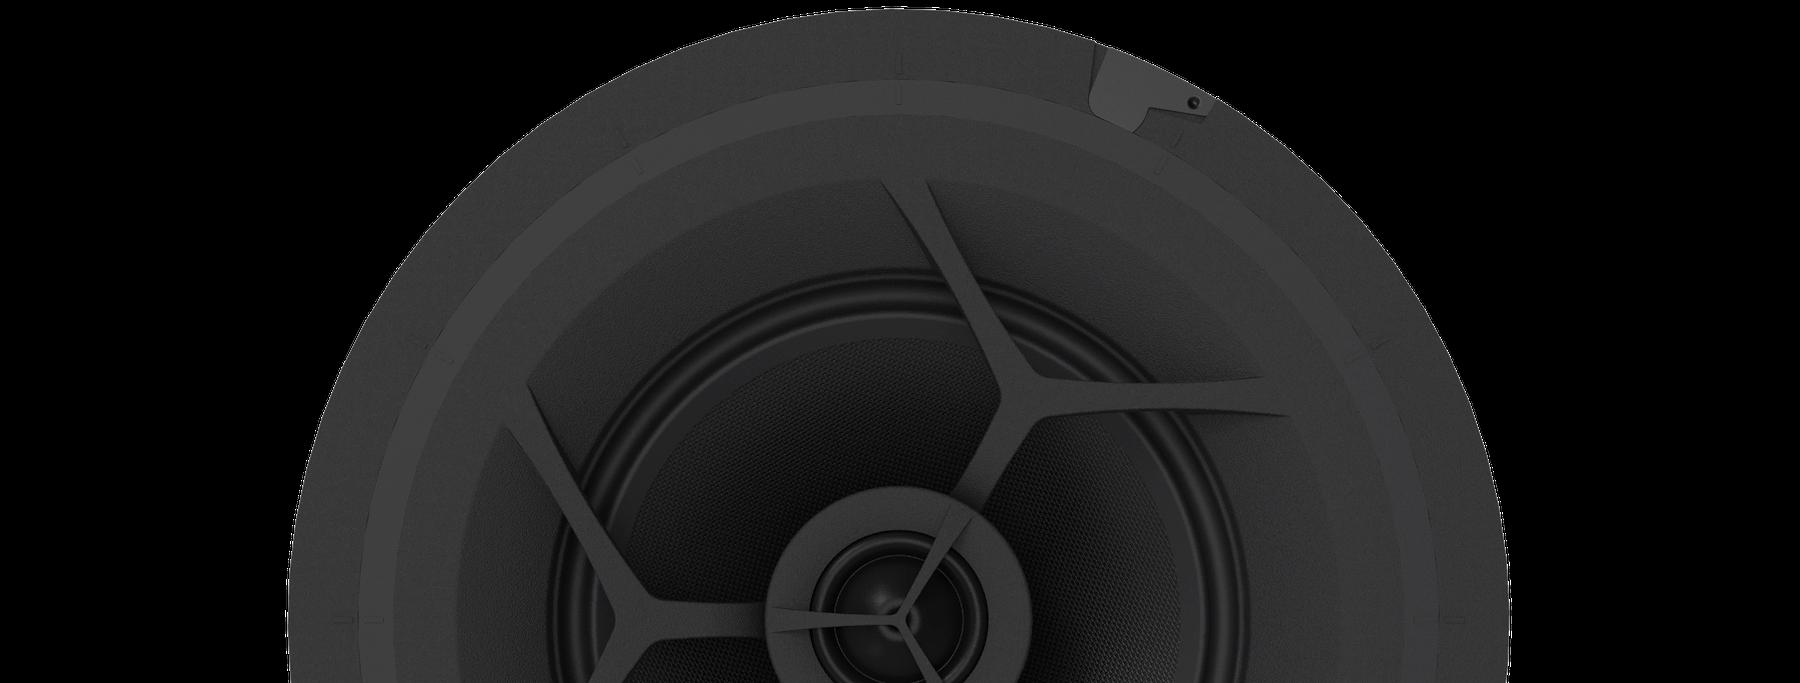 rendering of 8 inch speaker in black